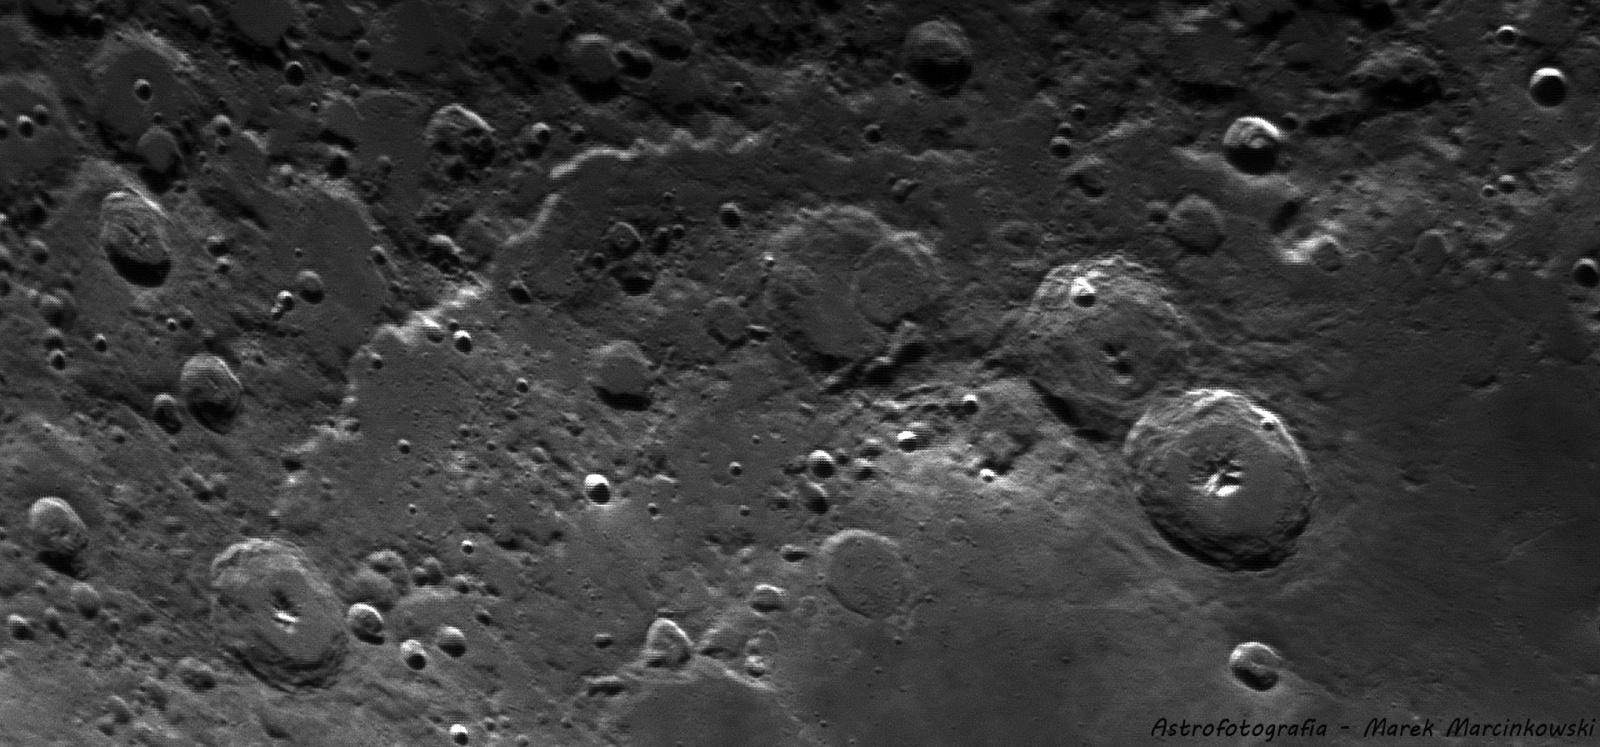 2020-12-21-1633_2-Saturn_lapl5_ap374_Drizzle30_conv_ps_kanal_G_crop_Astropolis.jpg